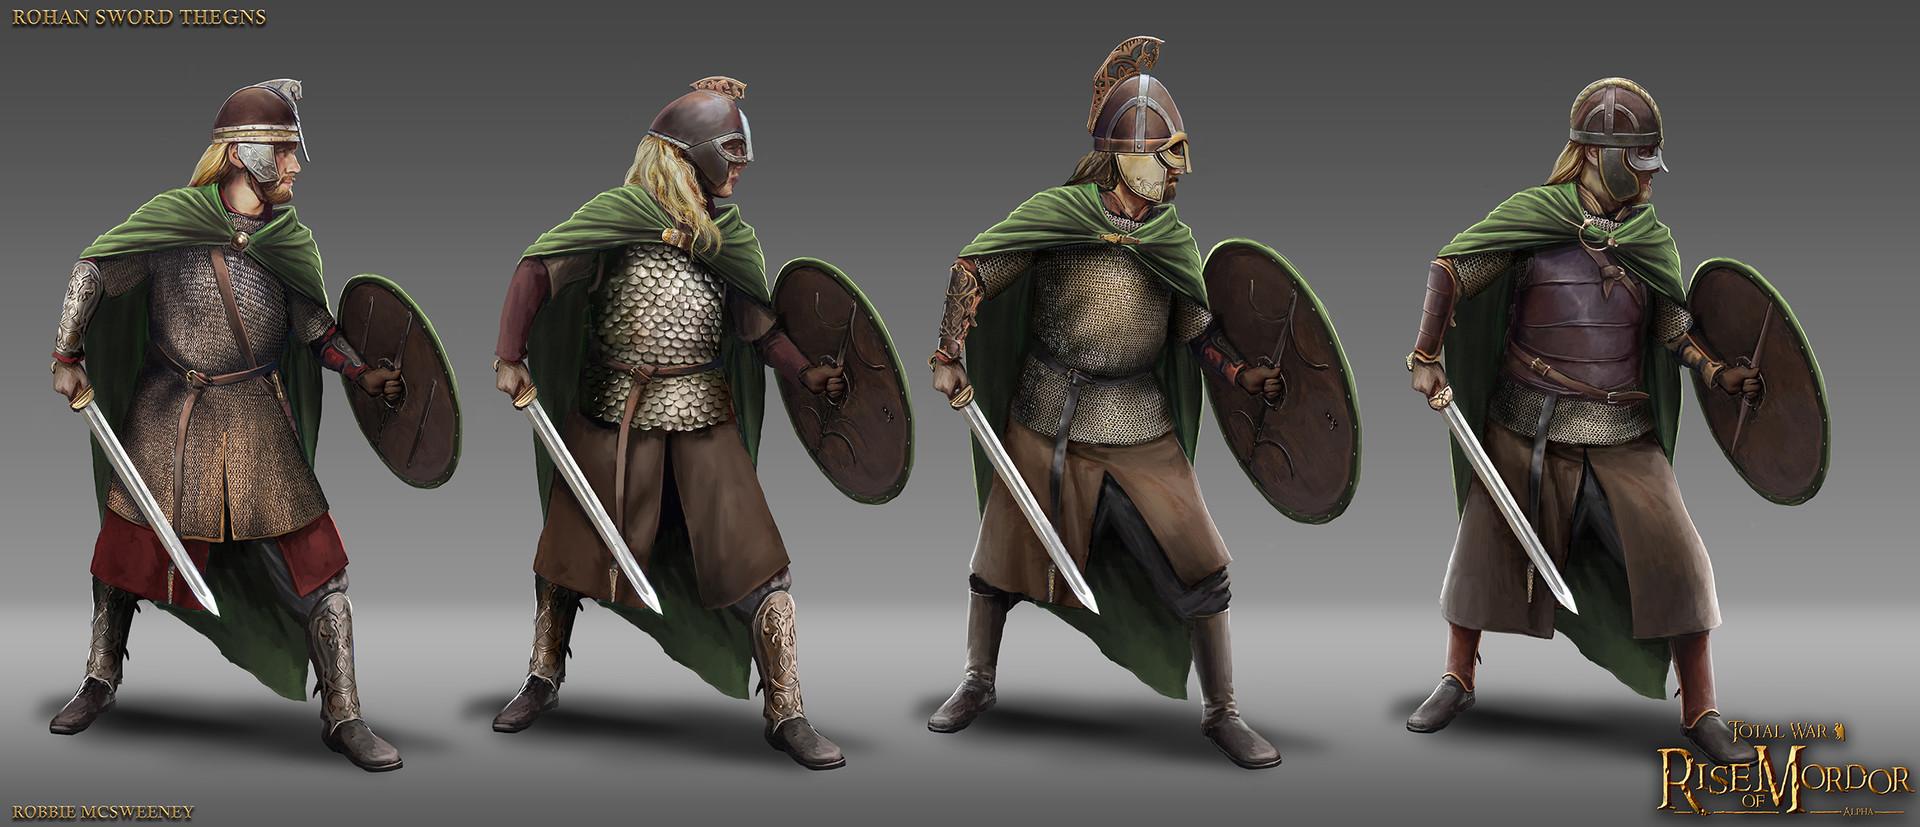 King Just - Warriors Drum (Hey-Ya-Ho)